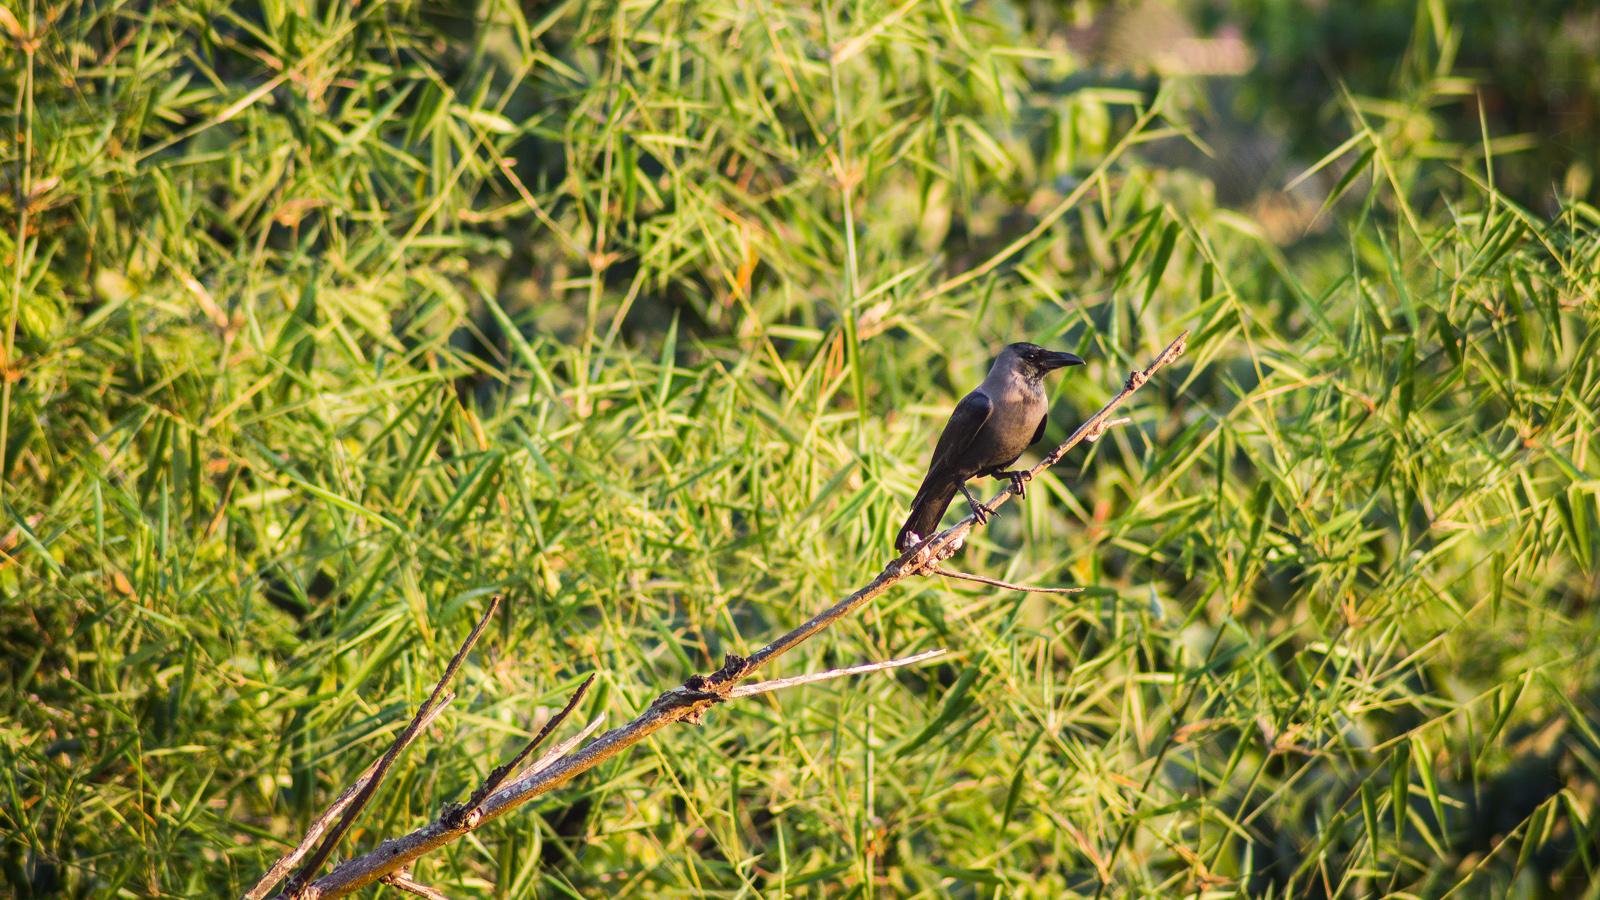 Bird-watching at Carambolim